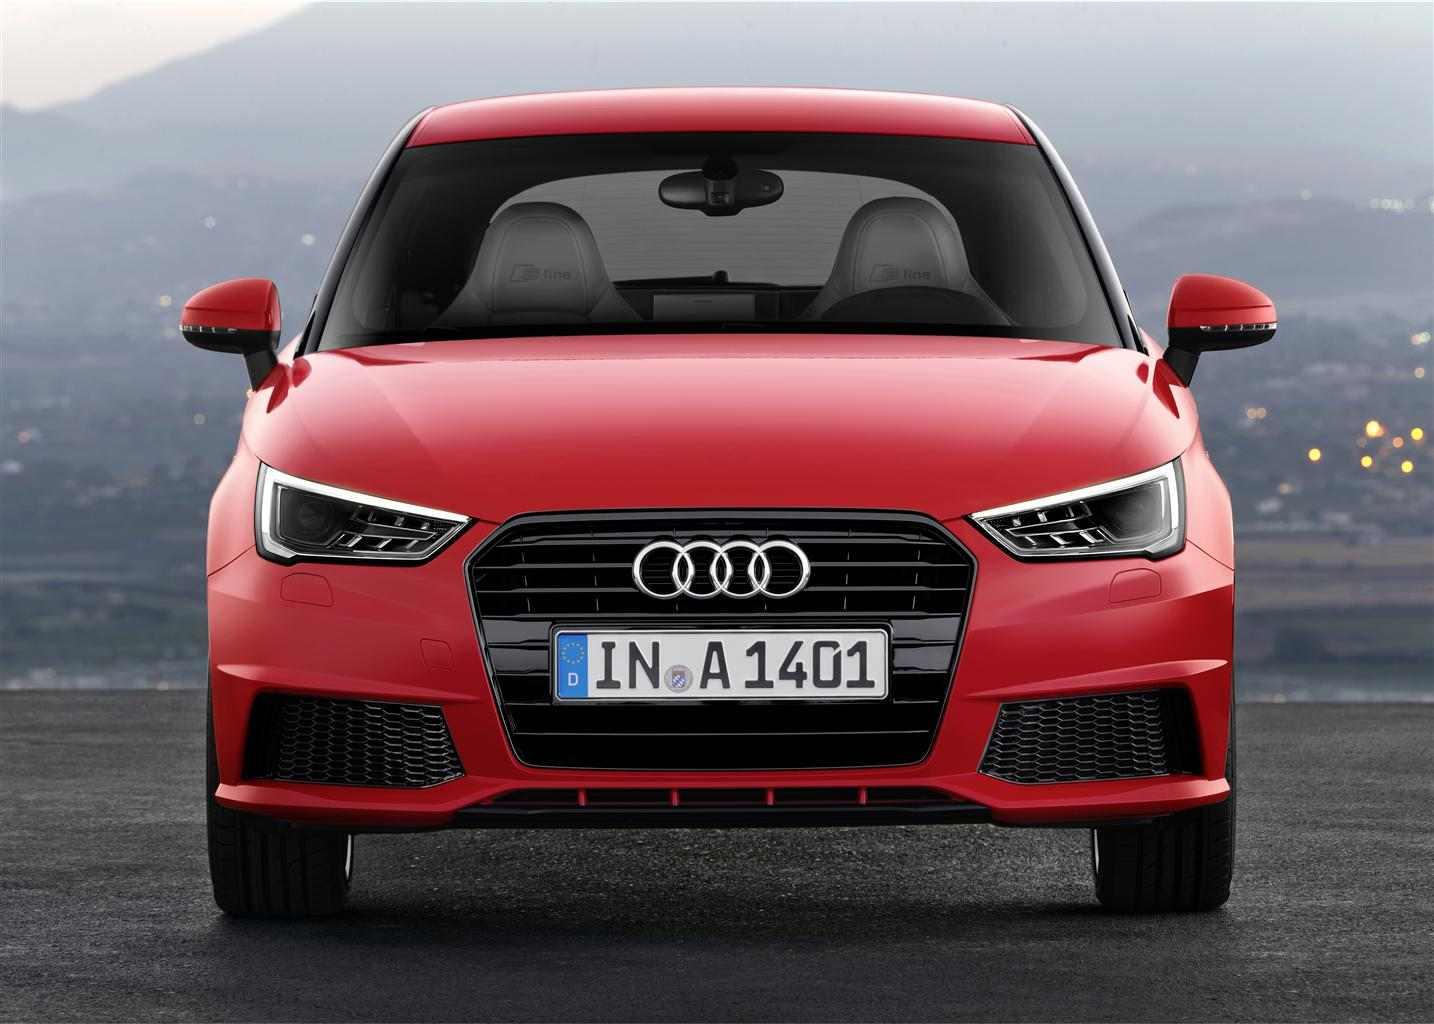 Nuove Audi A1 e A1 Sportback Sportive ed efficienti